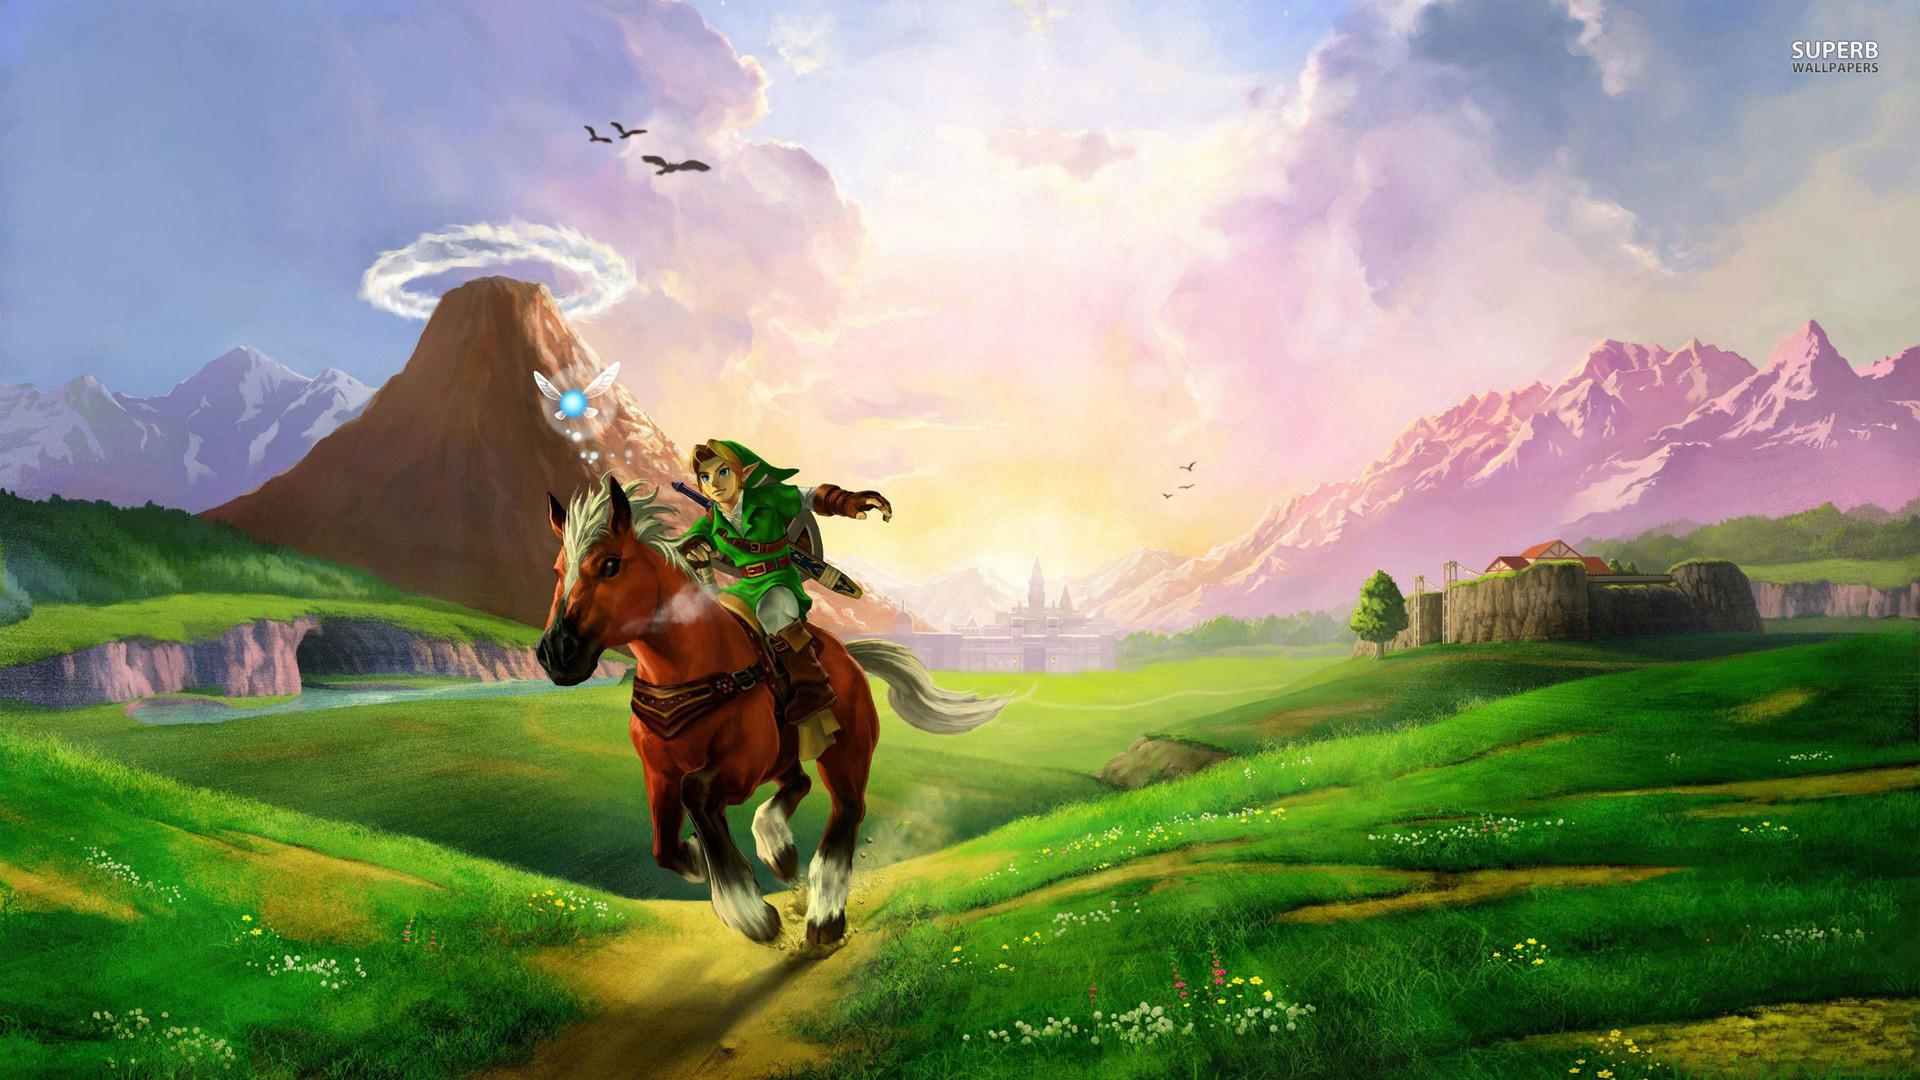 Legend of Zelda Link Wallpaper (70+ images)